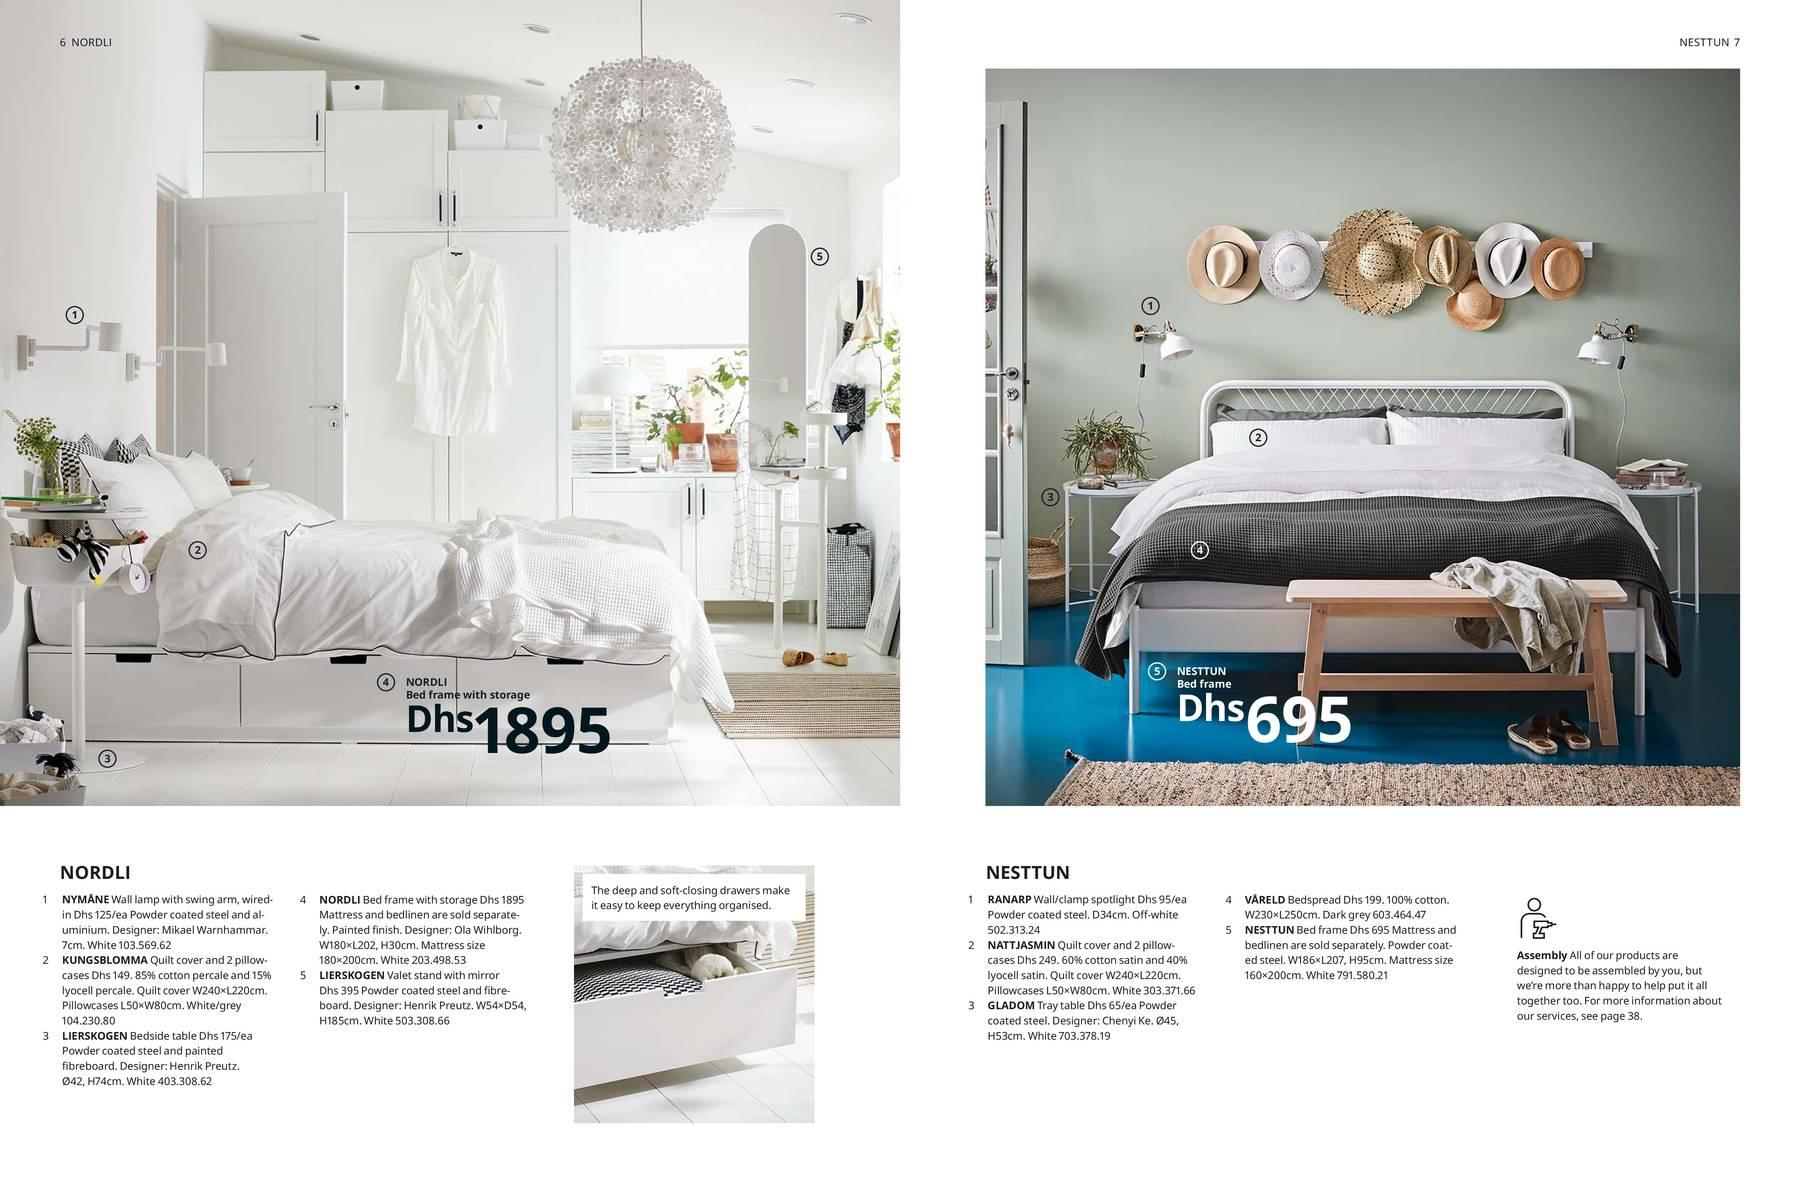 Bedroom 2020 Offers From Ikea Until 31st July Ikea Offers